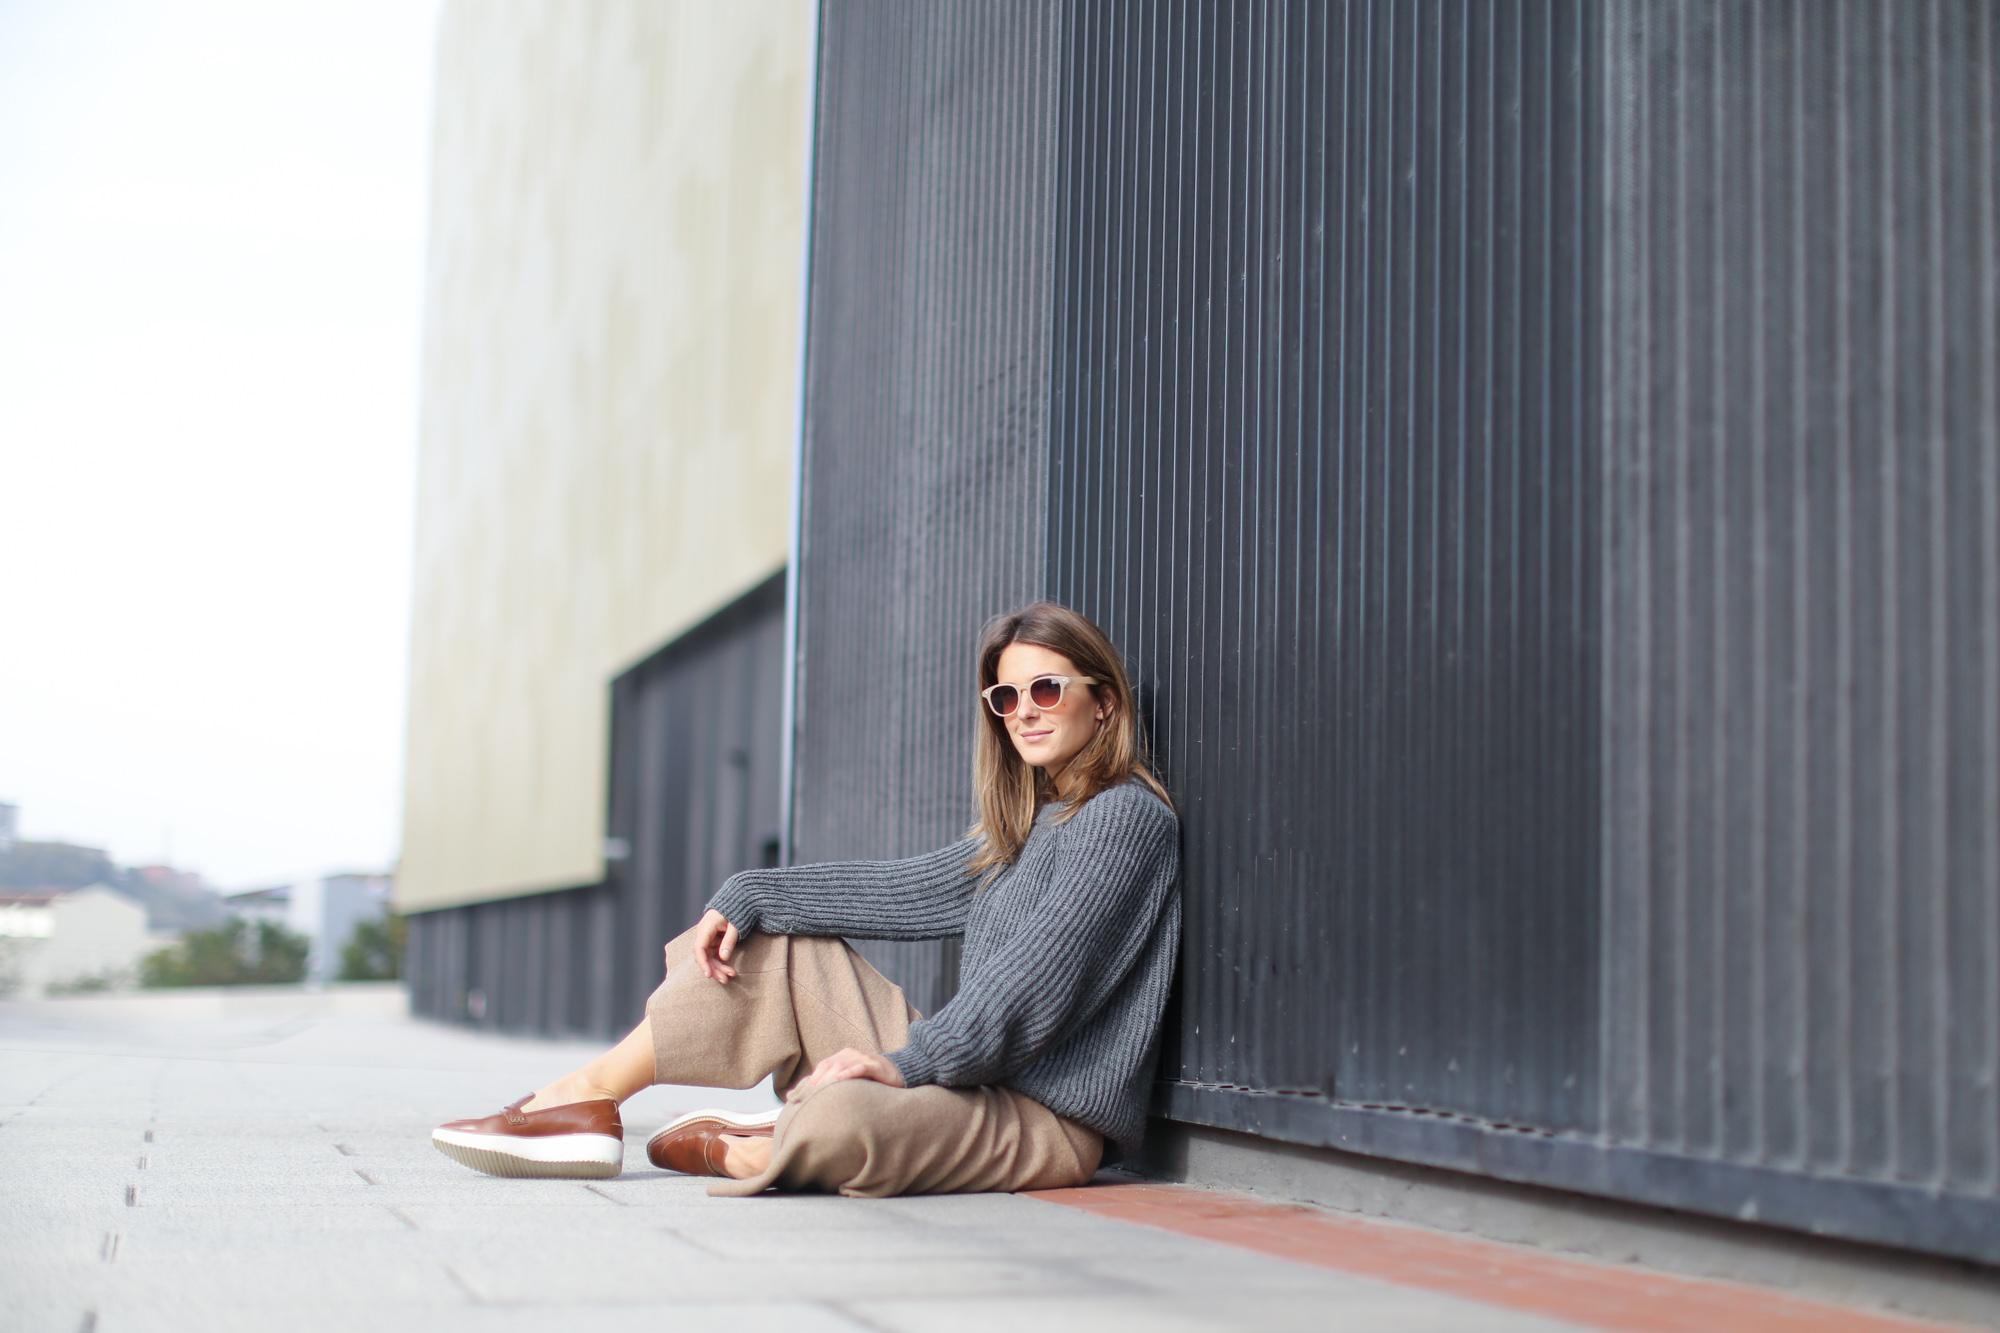 Clochet-streetstyle-zara-beige-wool-culottes-grey-chunky-knit-10